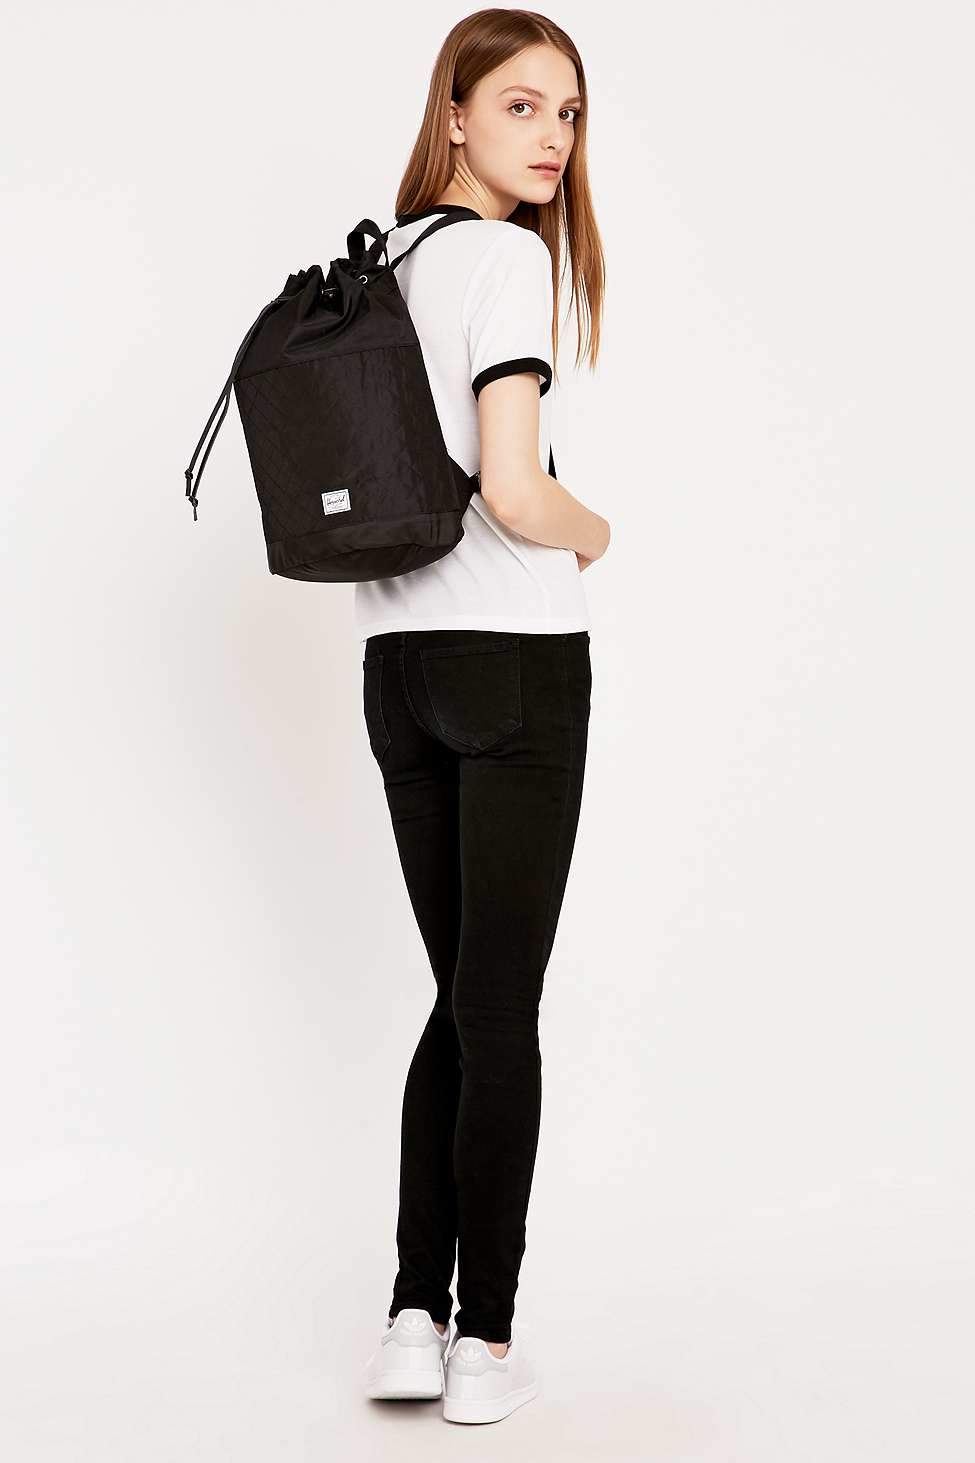 b51c7f51def Herschel Supply Co. Hanson Black Quilted Backpack in Black - Lyst